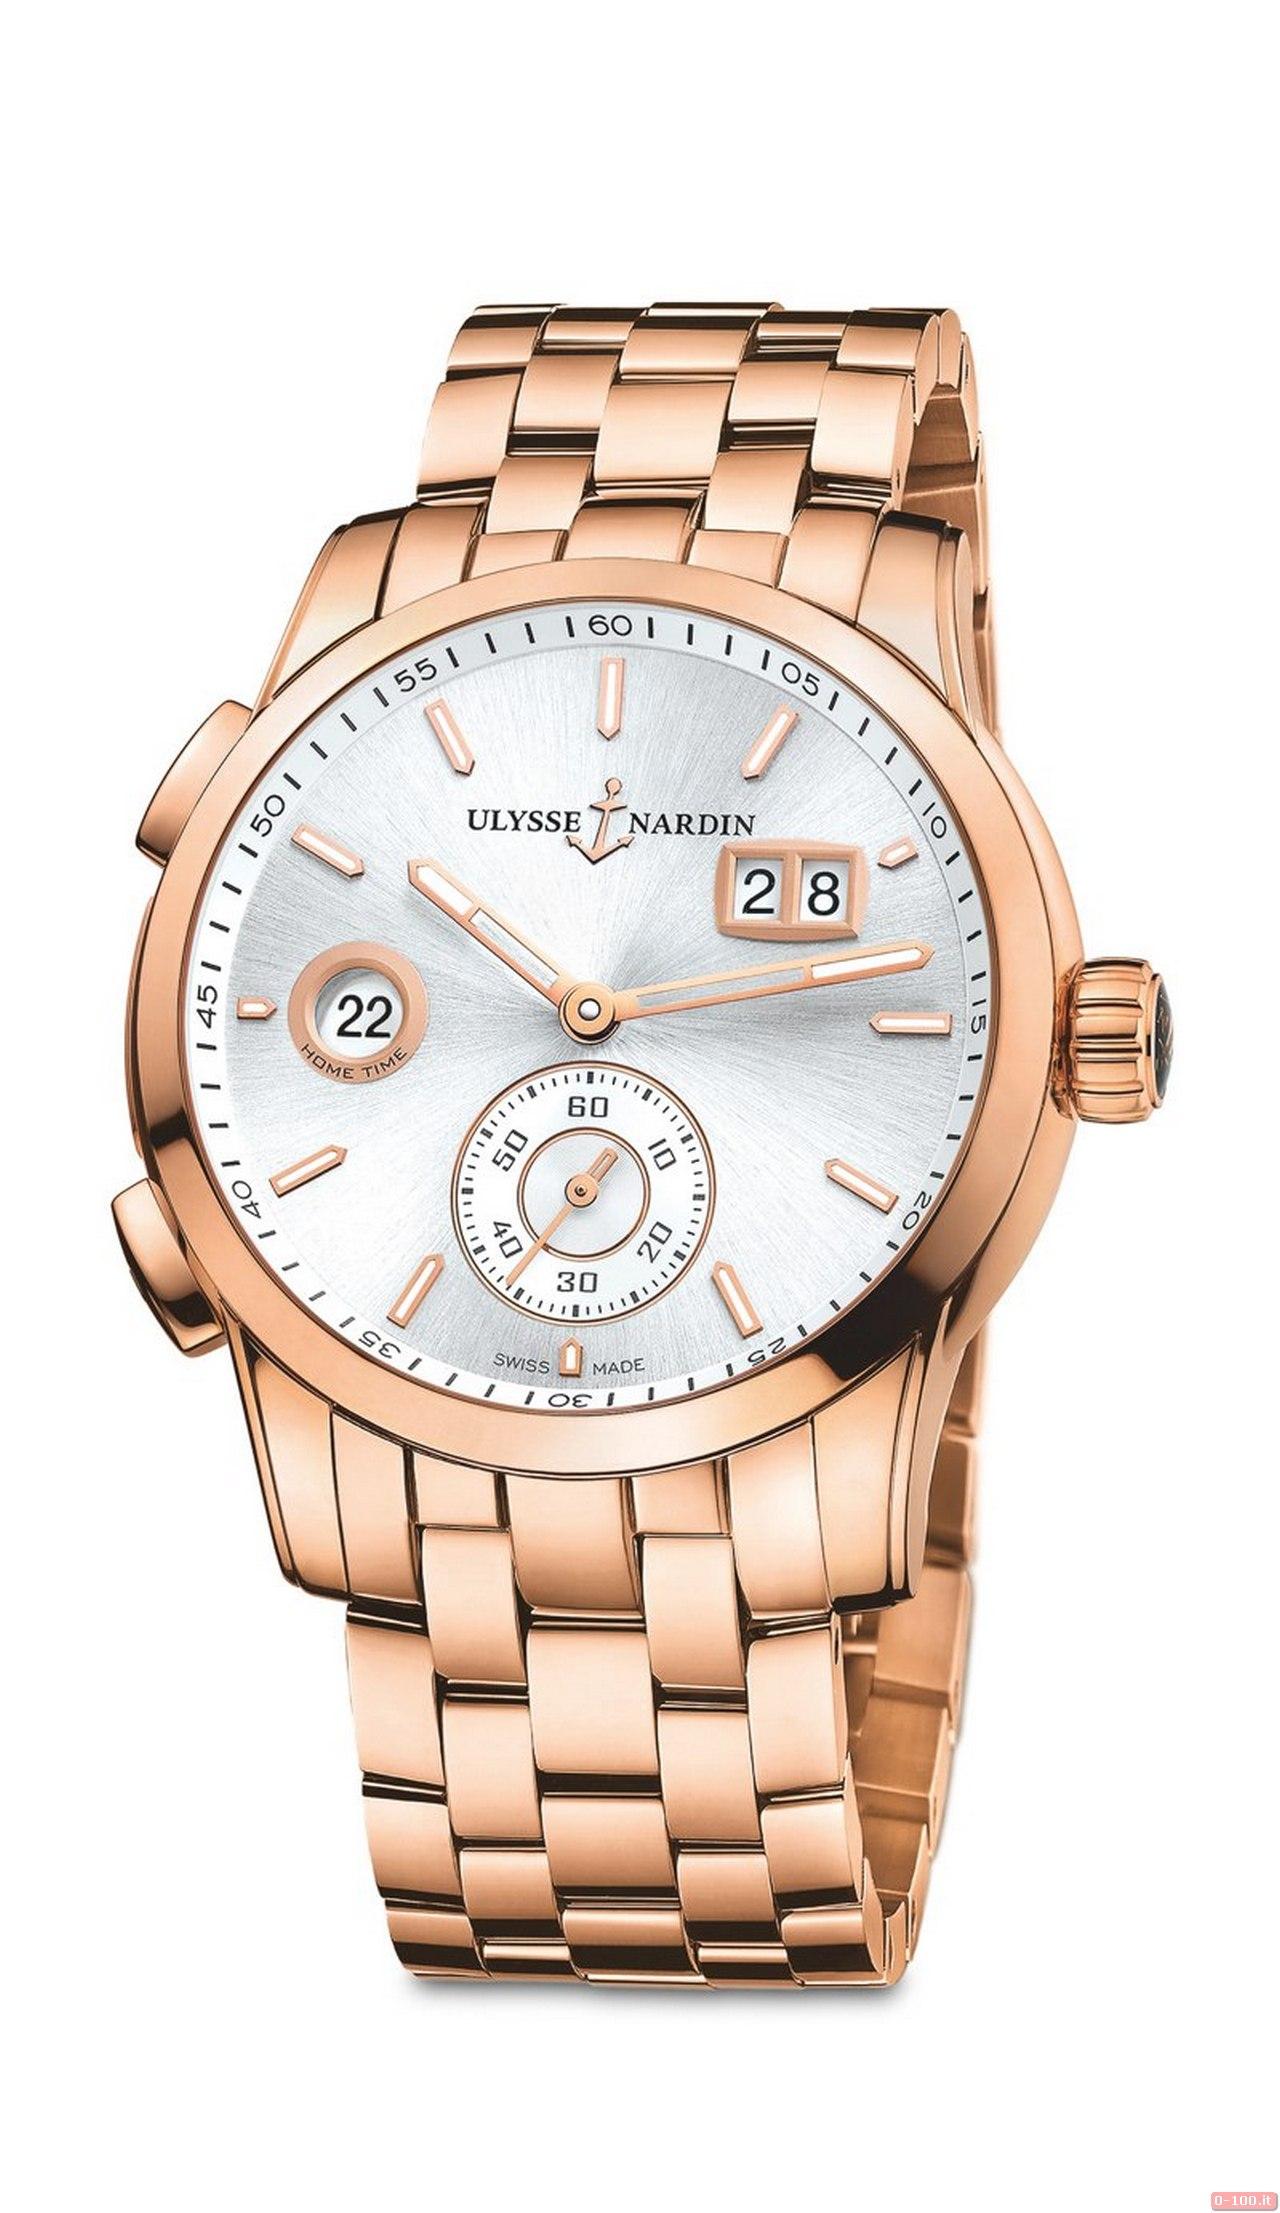 anteprima-baselworld-2014-ulysse-nardin-dual-time-manufacture_0-1005